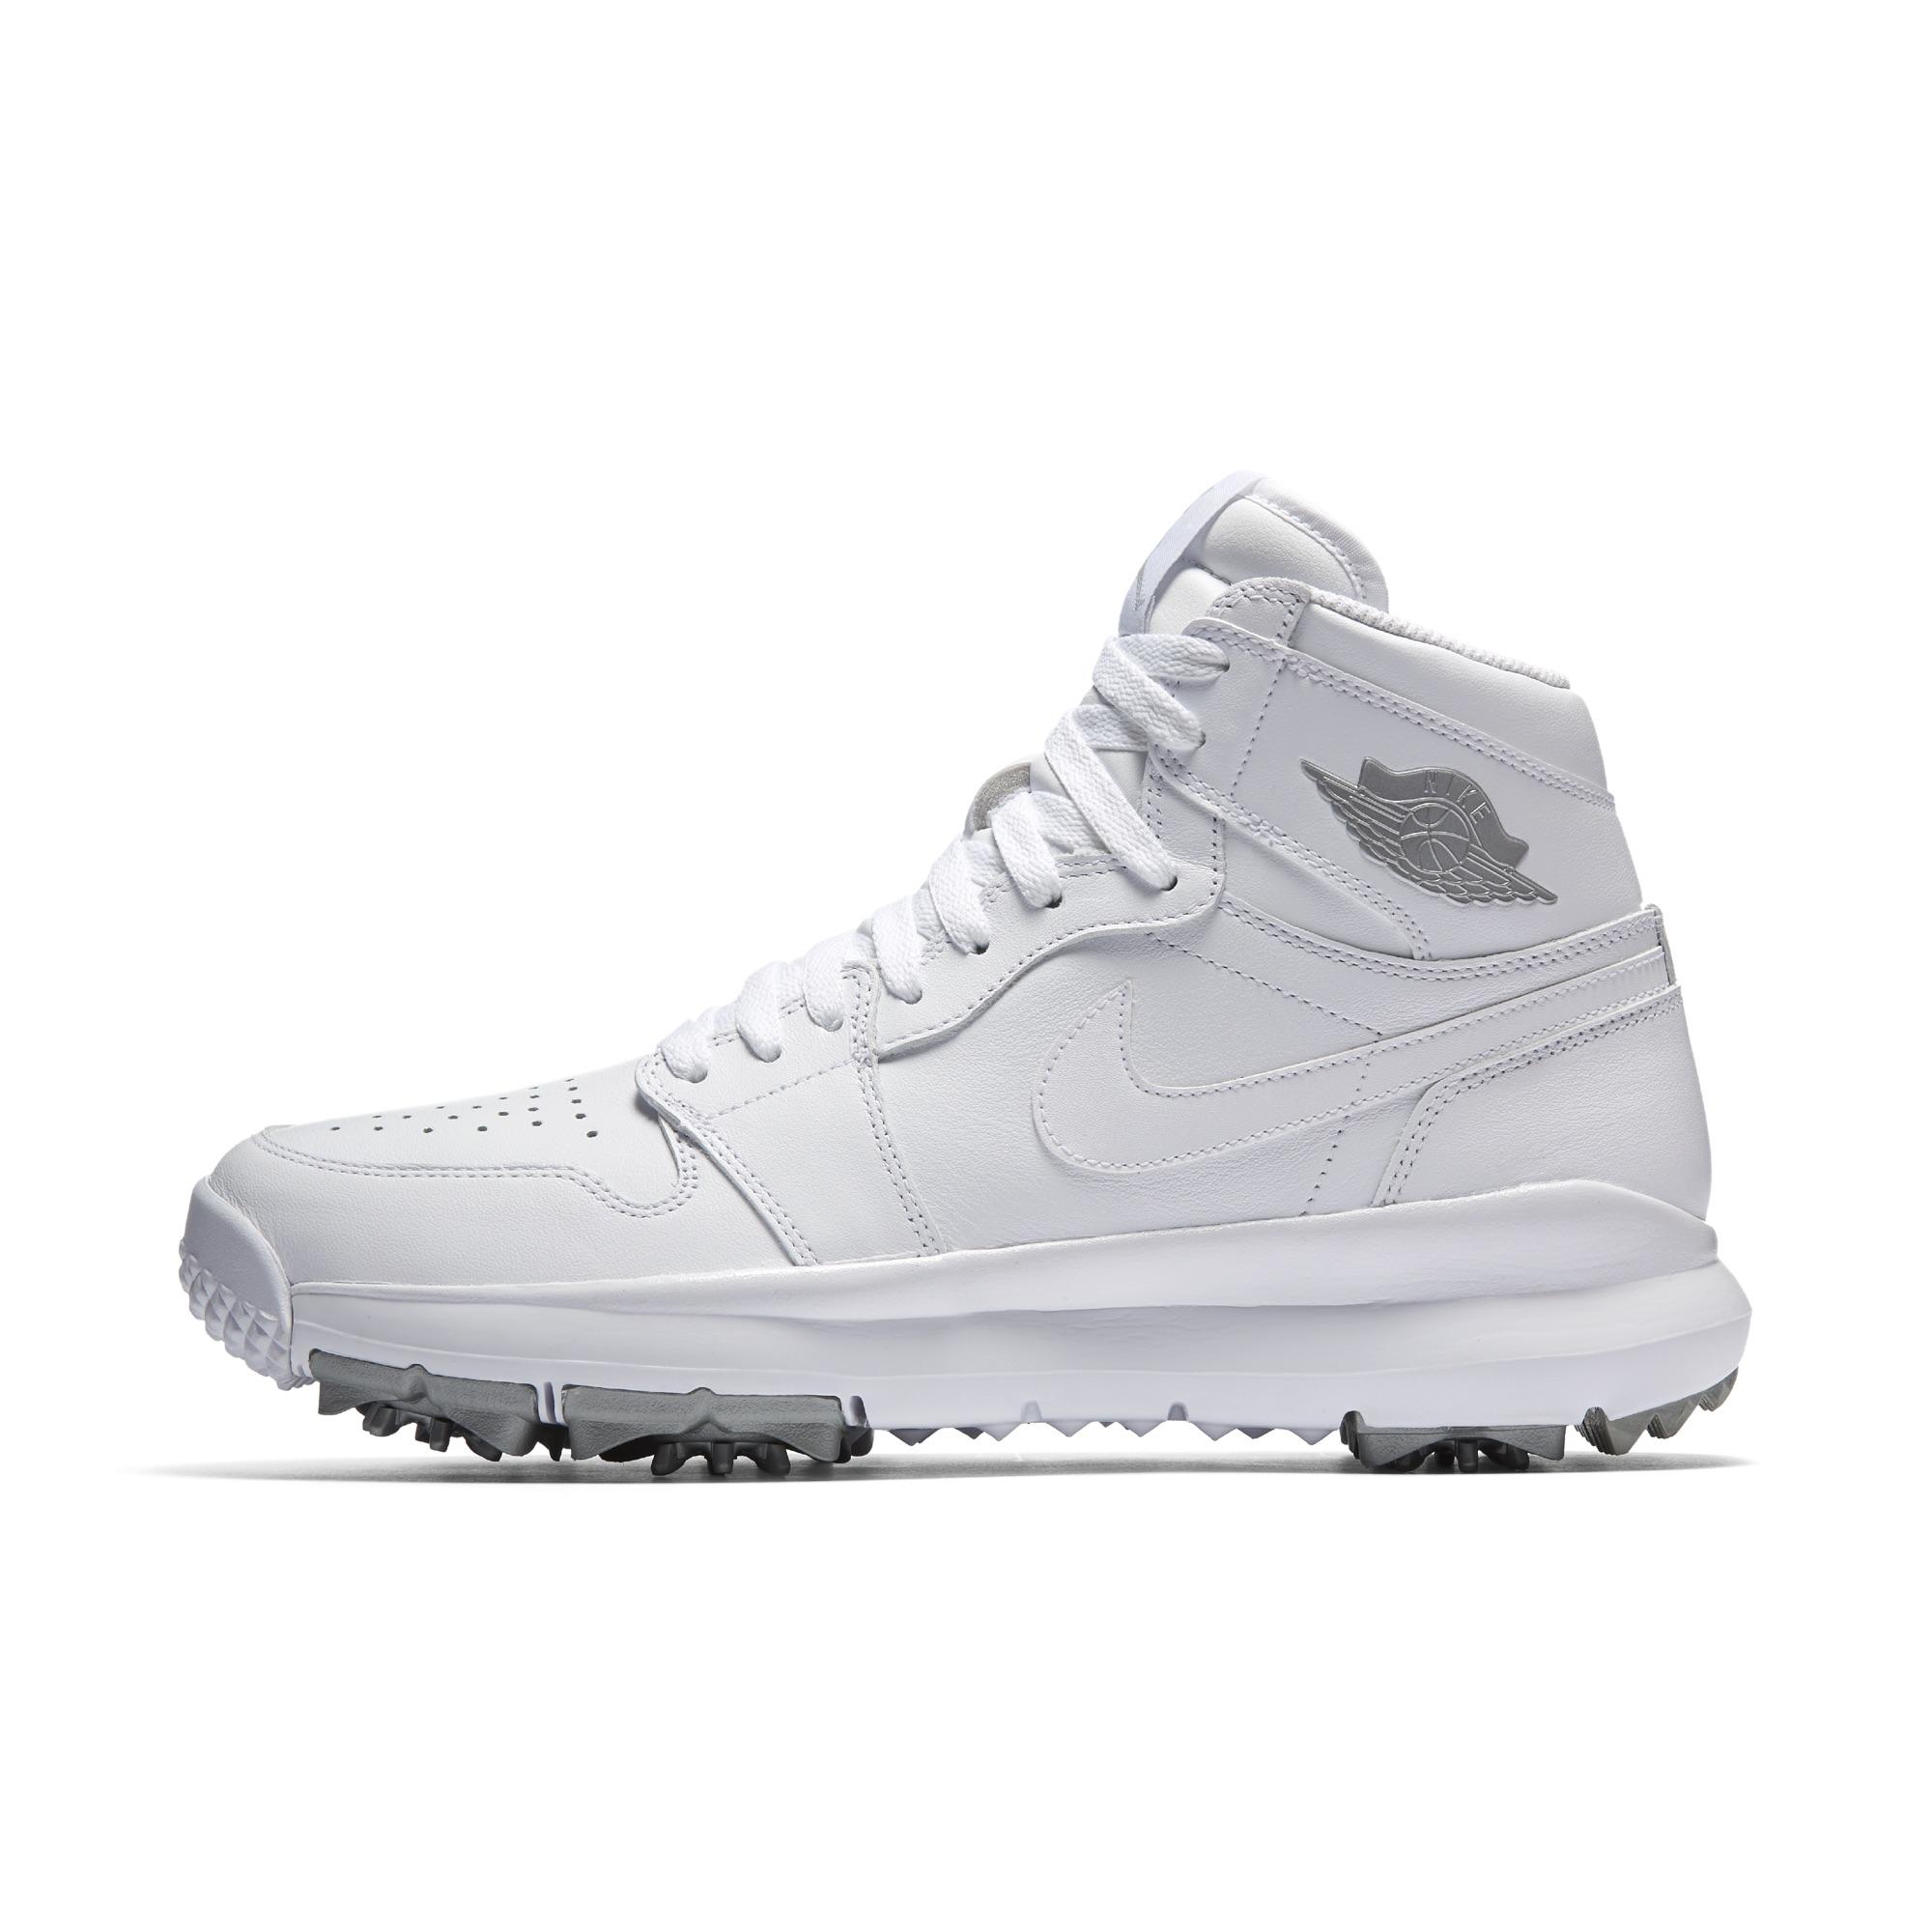 air jordan high top golf shoes size 10.5